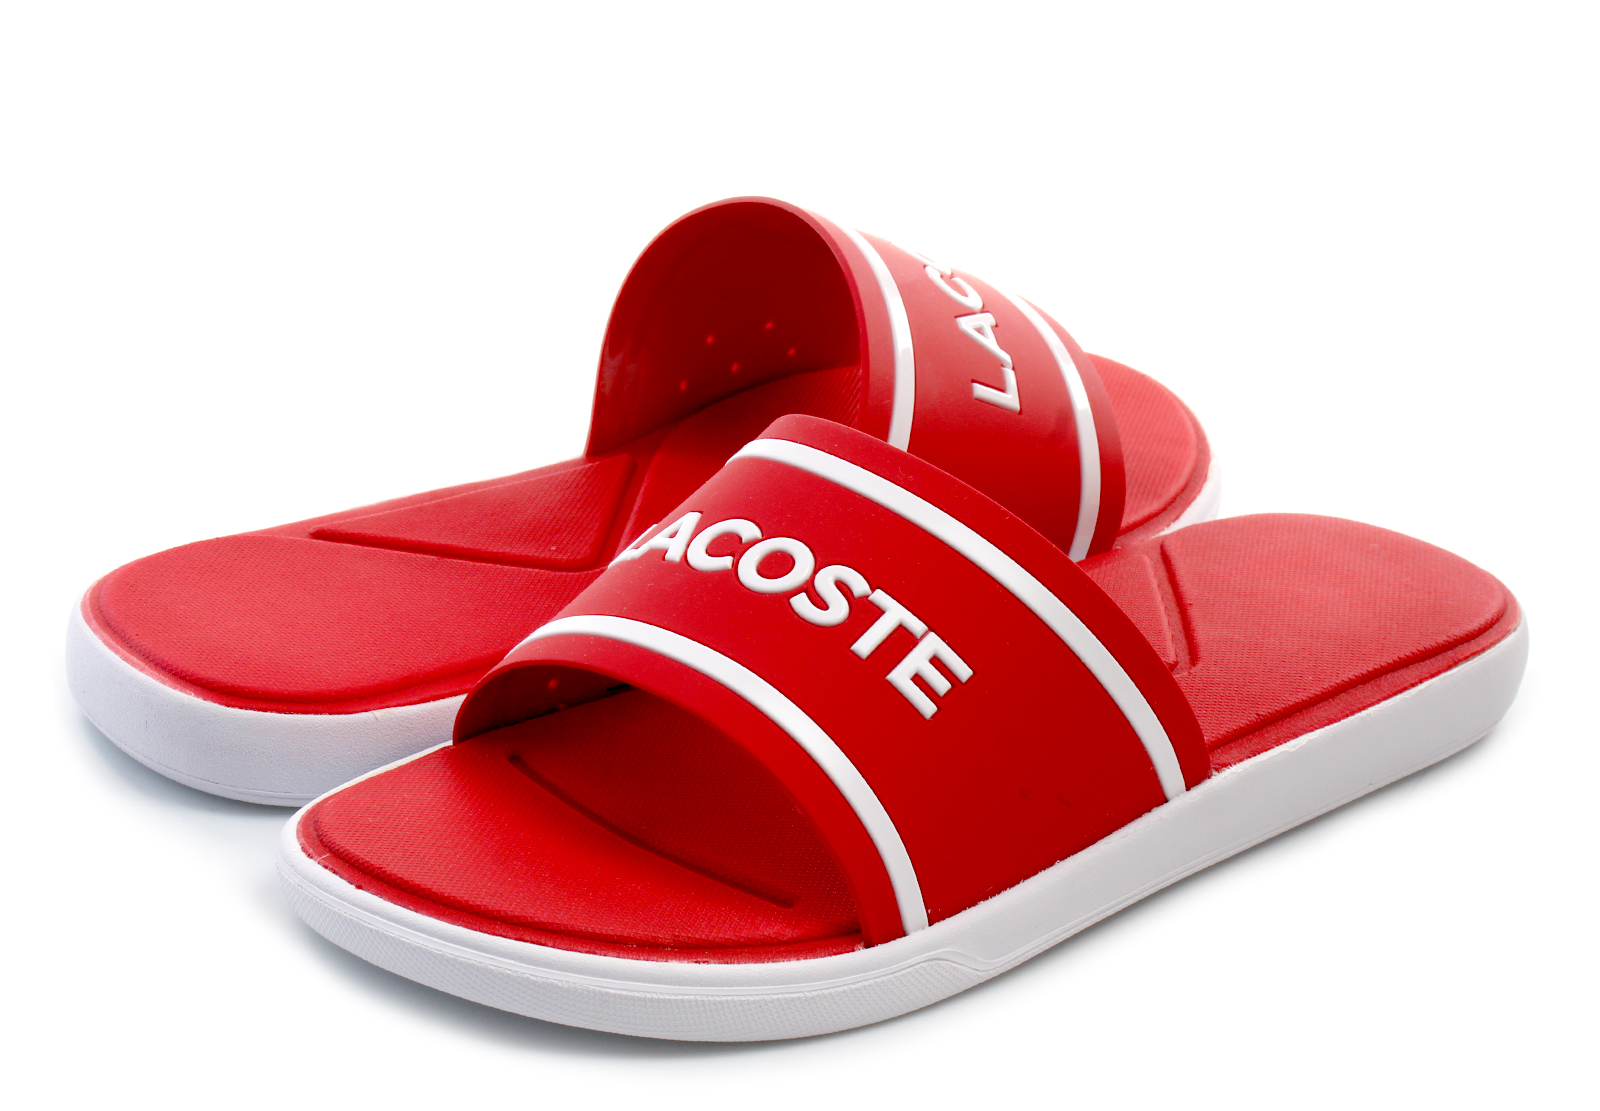 65f2b3a93e Lacoste Papucs - L.30 Slide - 182cam0063-17k - Office Shoes Magyarország